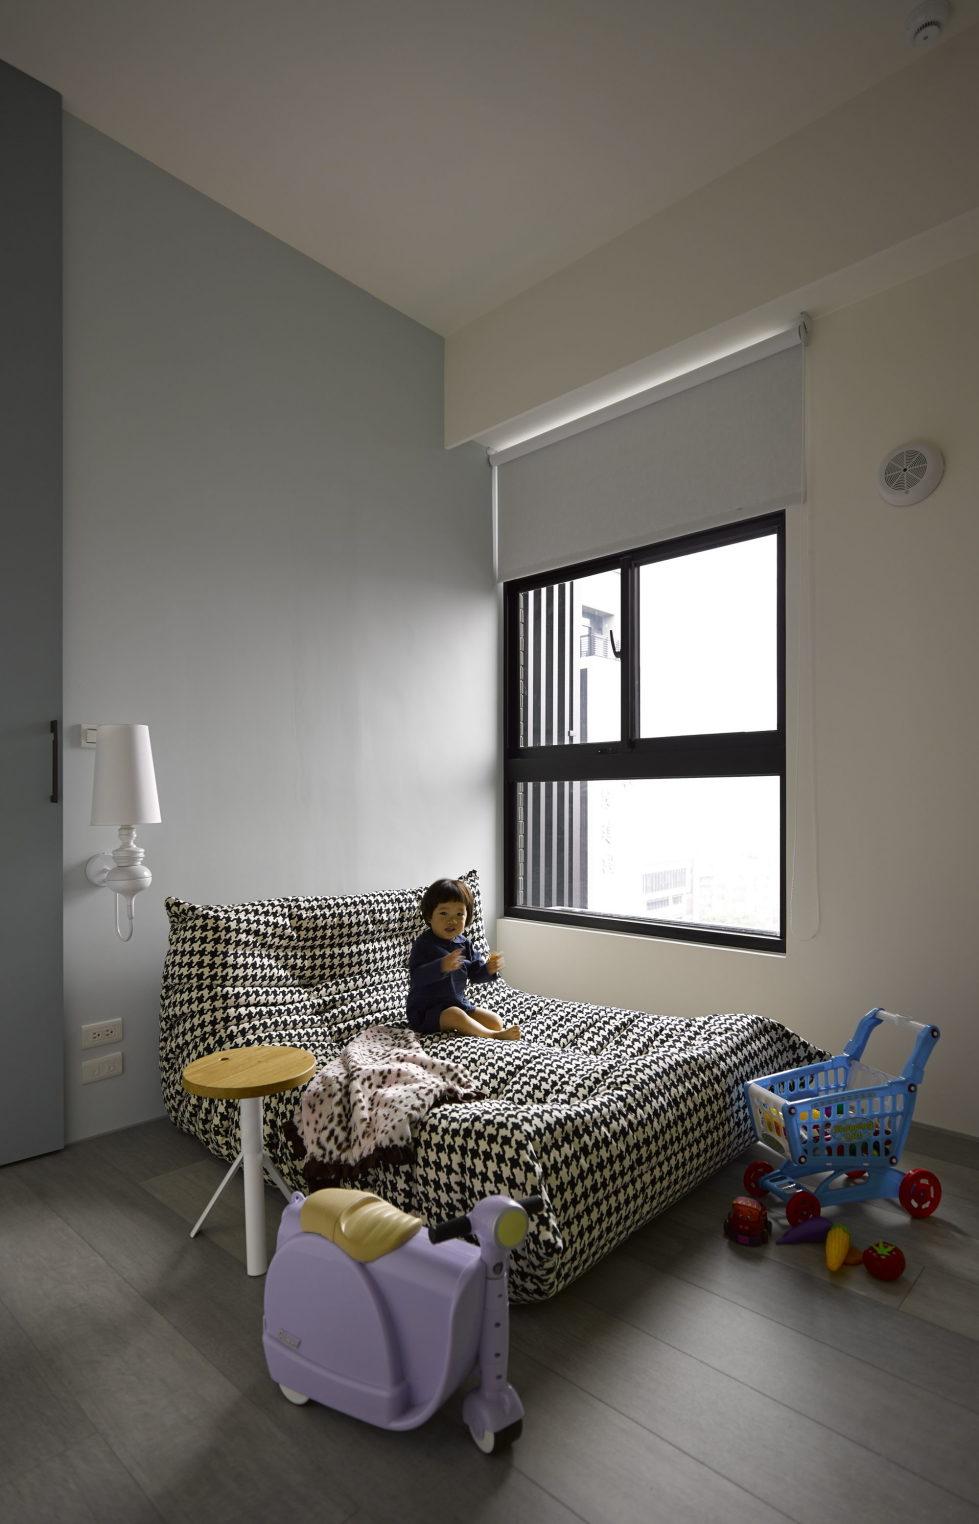 Modern Three-Room Apartment From Ganna Design Studio In Taipei, Taiwan 12